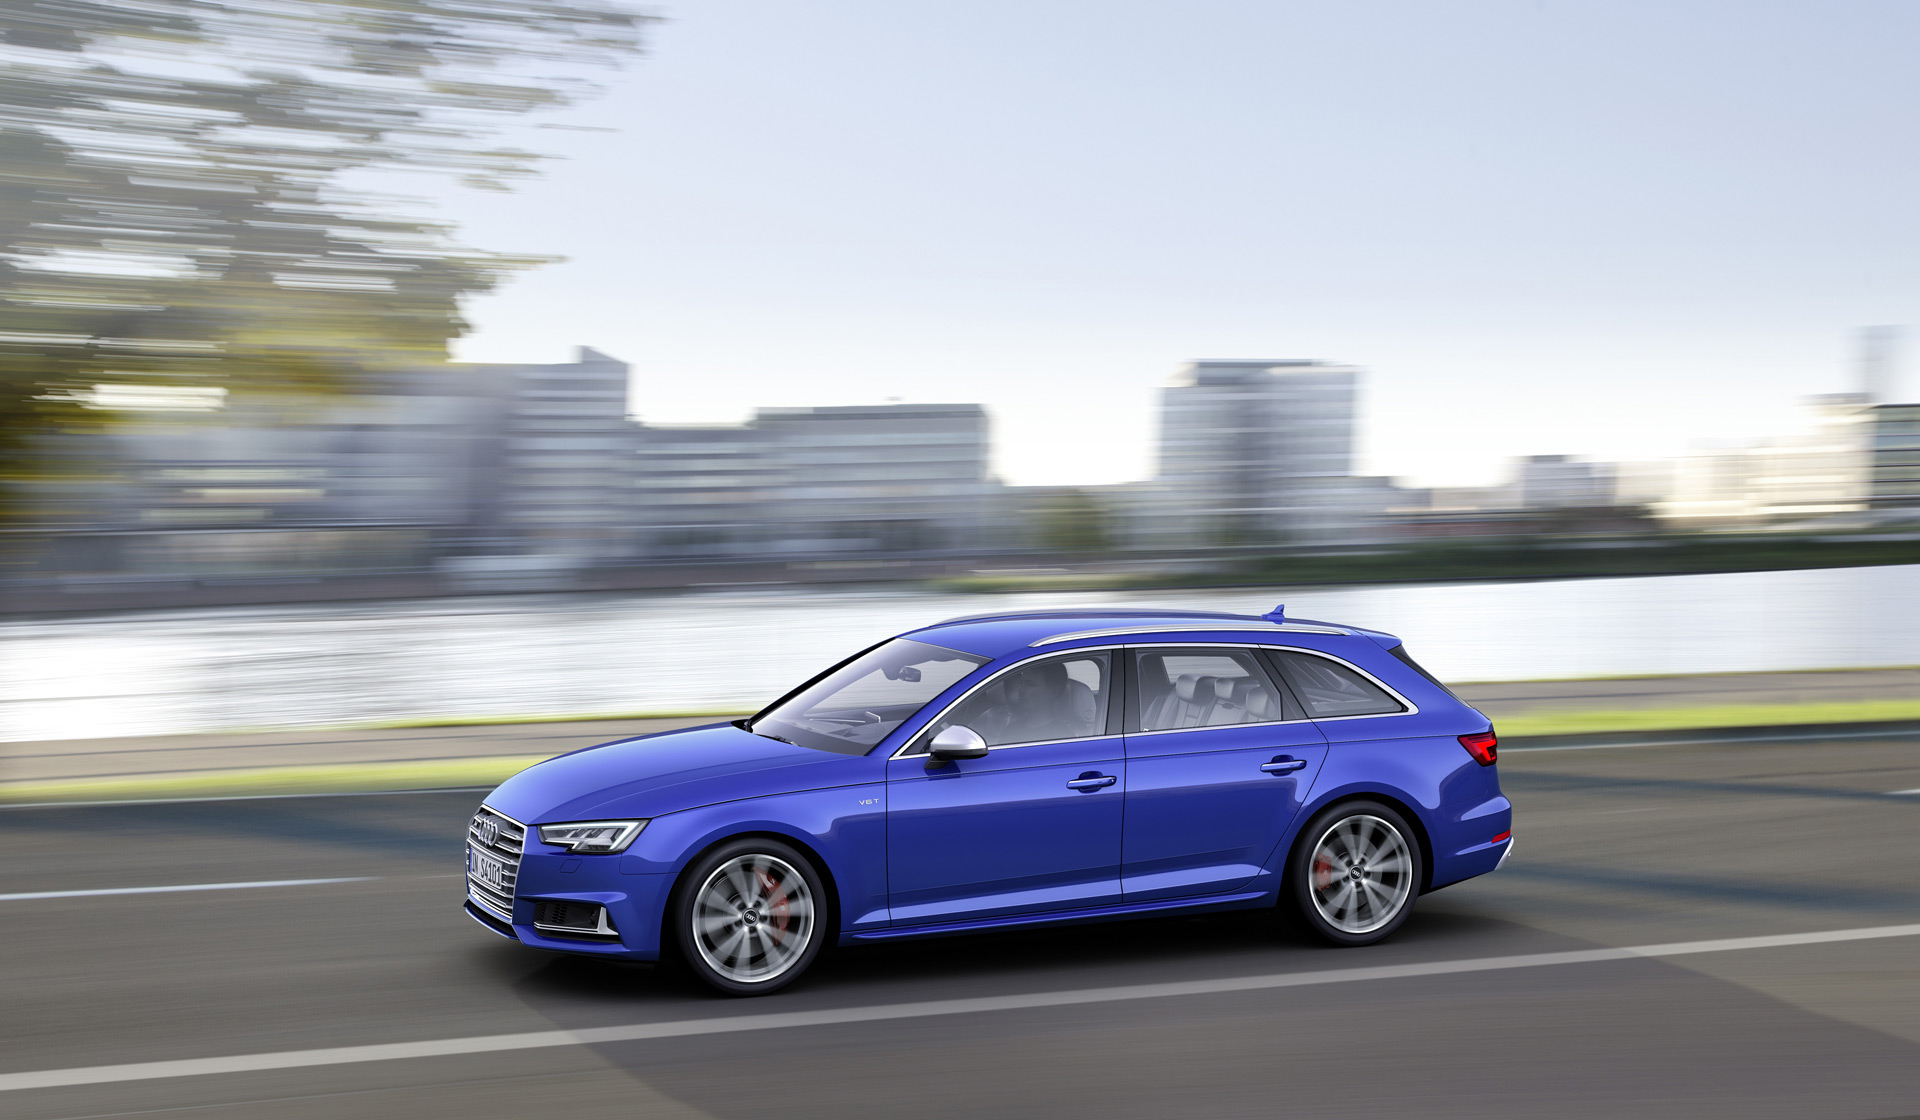 Audi S Avant Set For Geneva Motor Show - Audi s4 avant